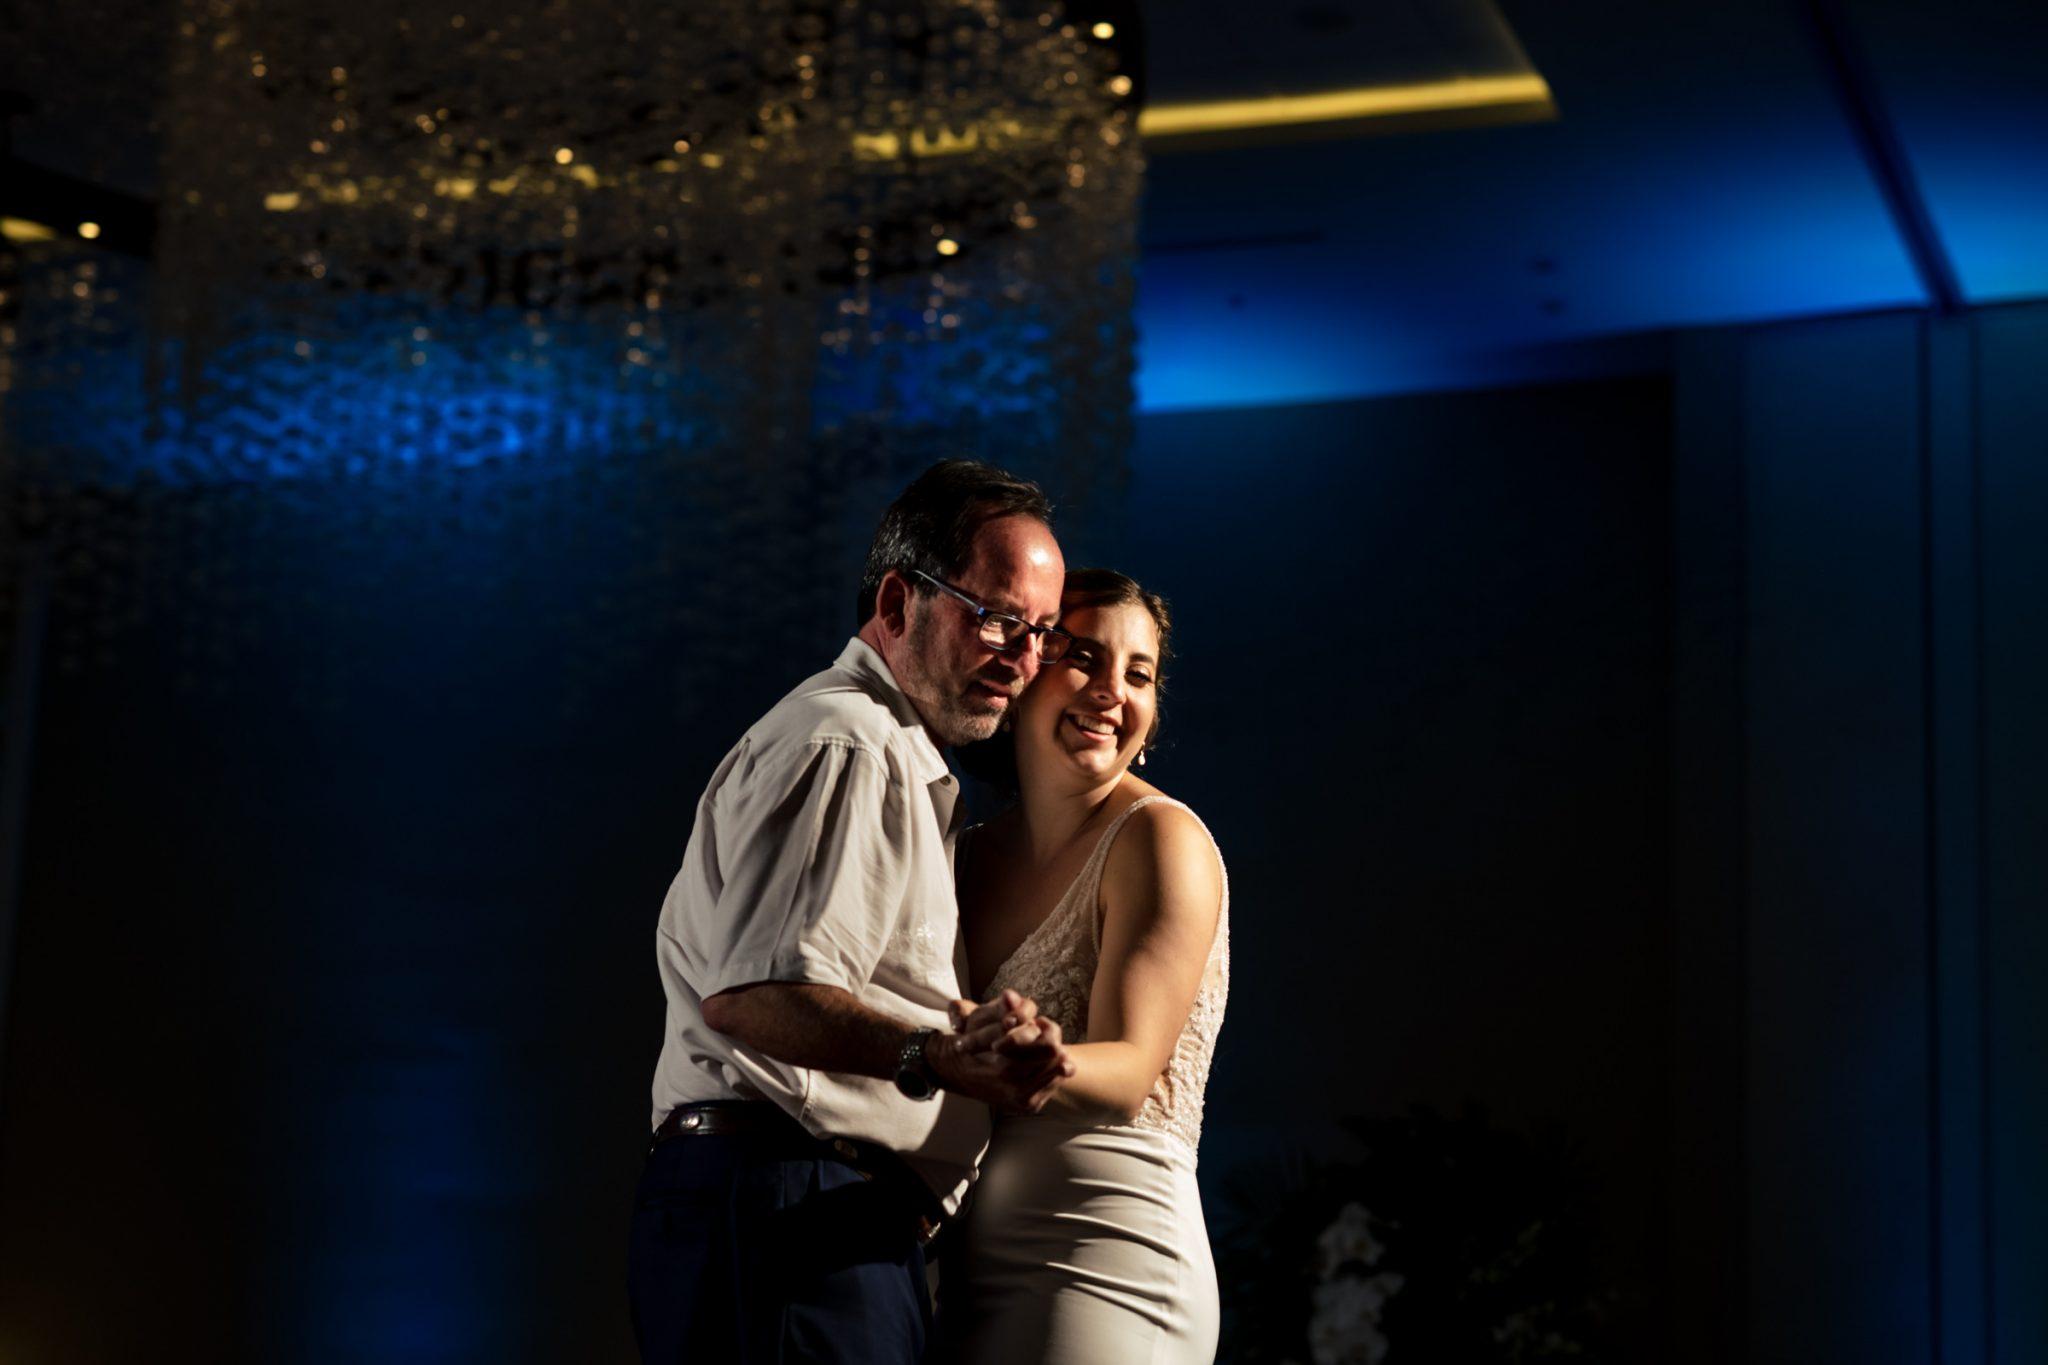 father of bride dancing with daughter playa largo resort wedding